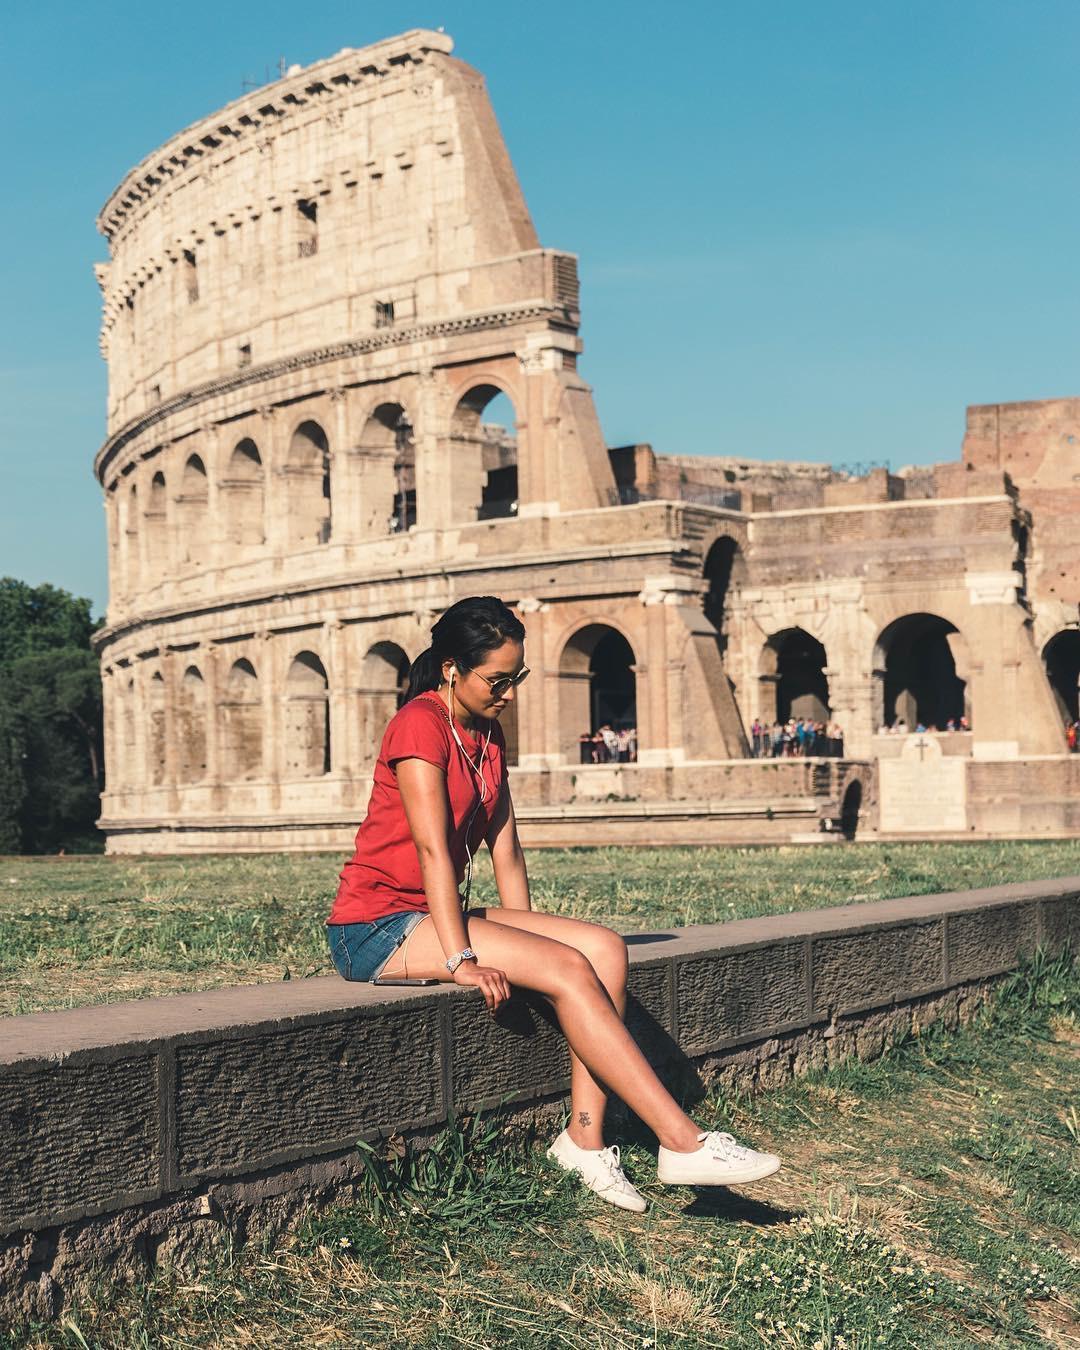 Estrella_Colosseum.JPG